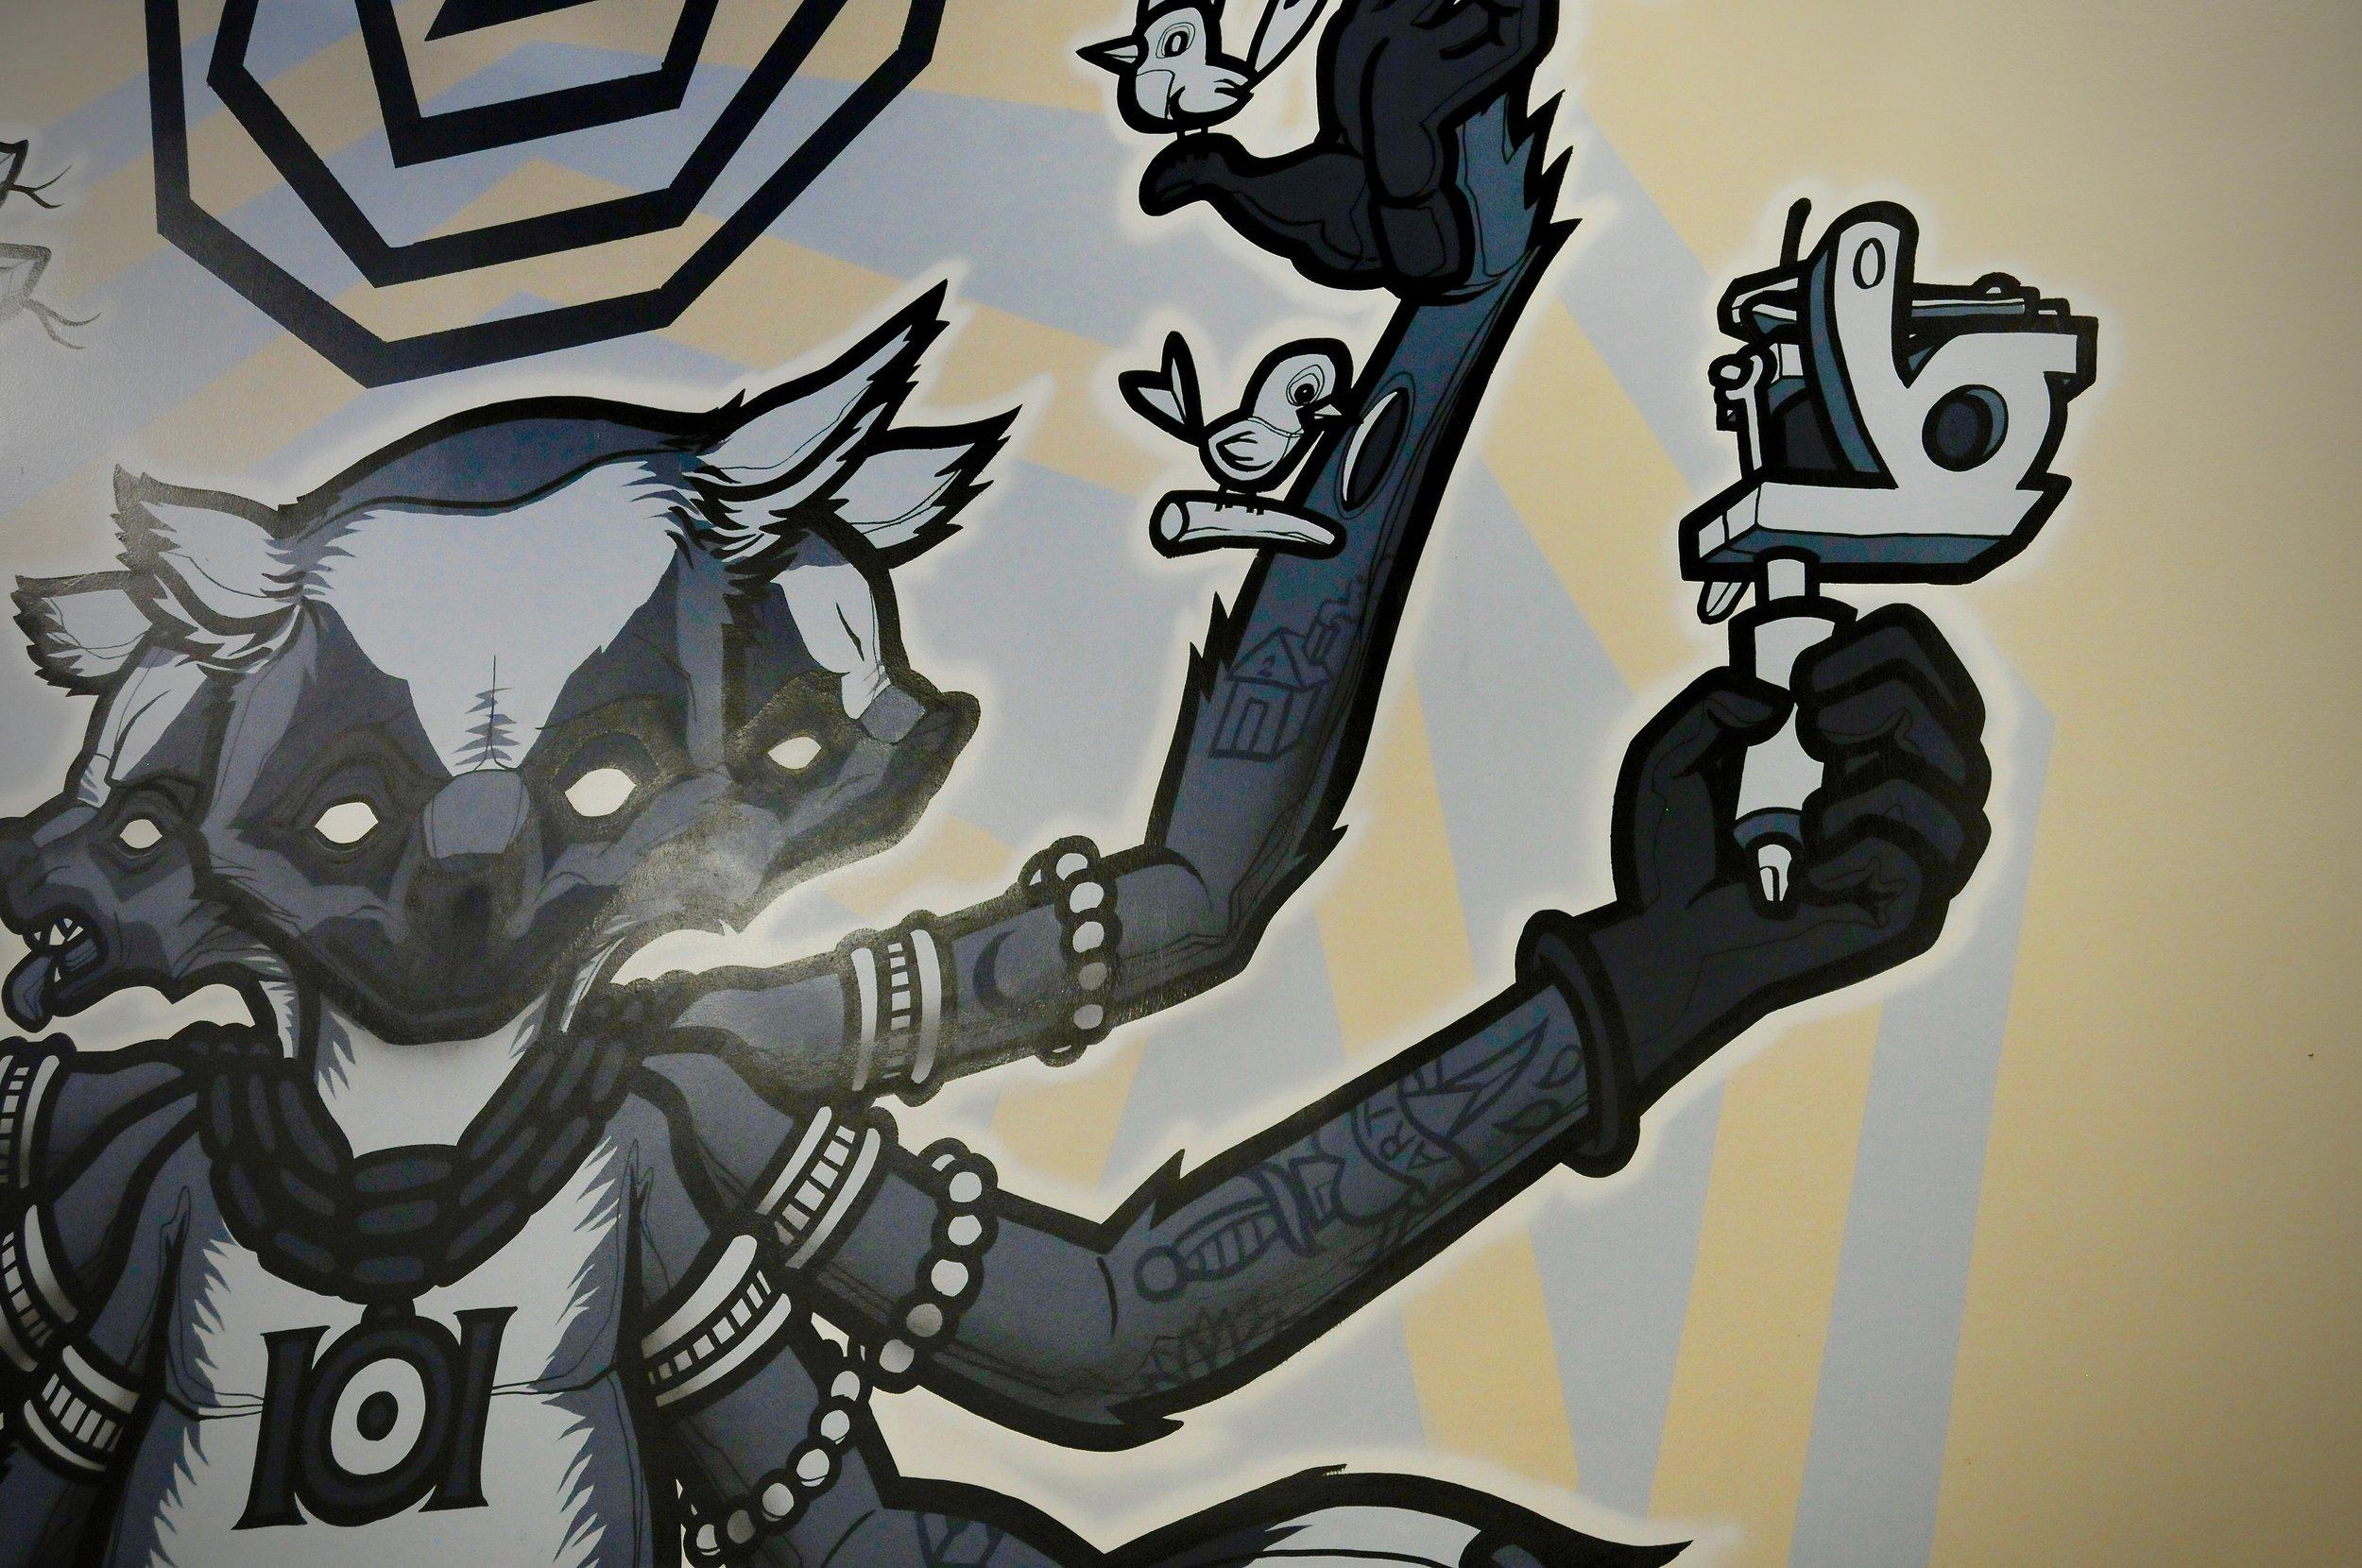 the-east-tattoo---salon-design_42867109640_o.jpg